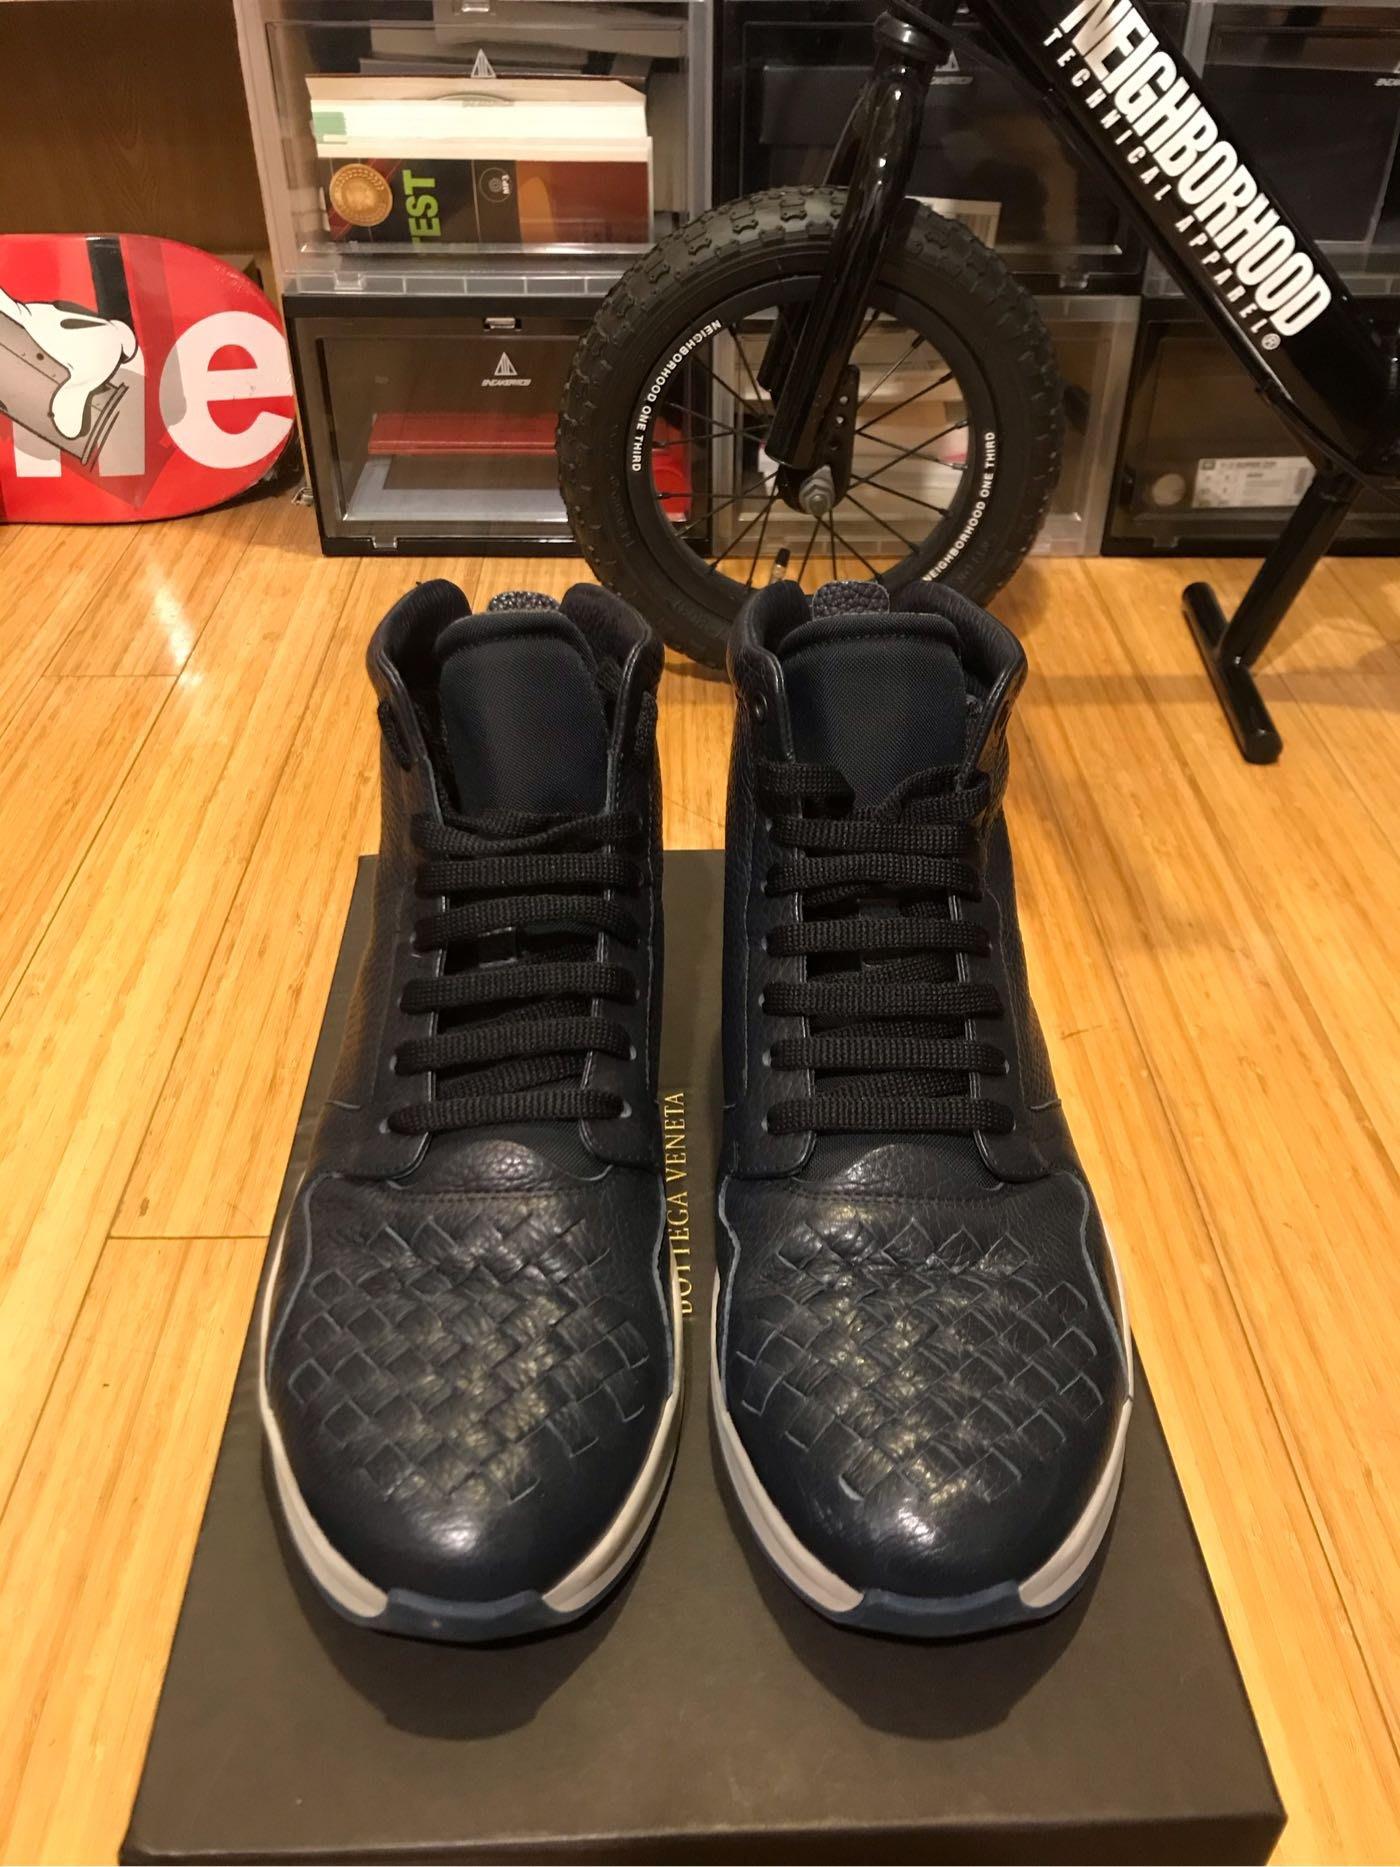 BottegaVenetta BV sneaker 高筒皮革運動鞋 免稅購入 EU42 極少穿11000 原價22150